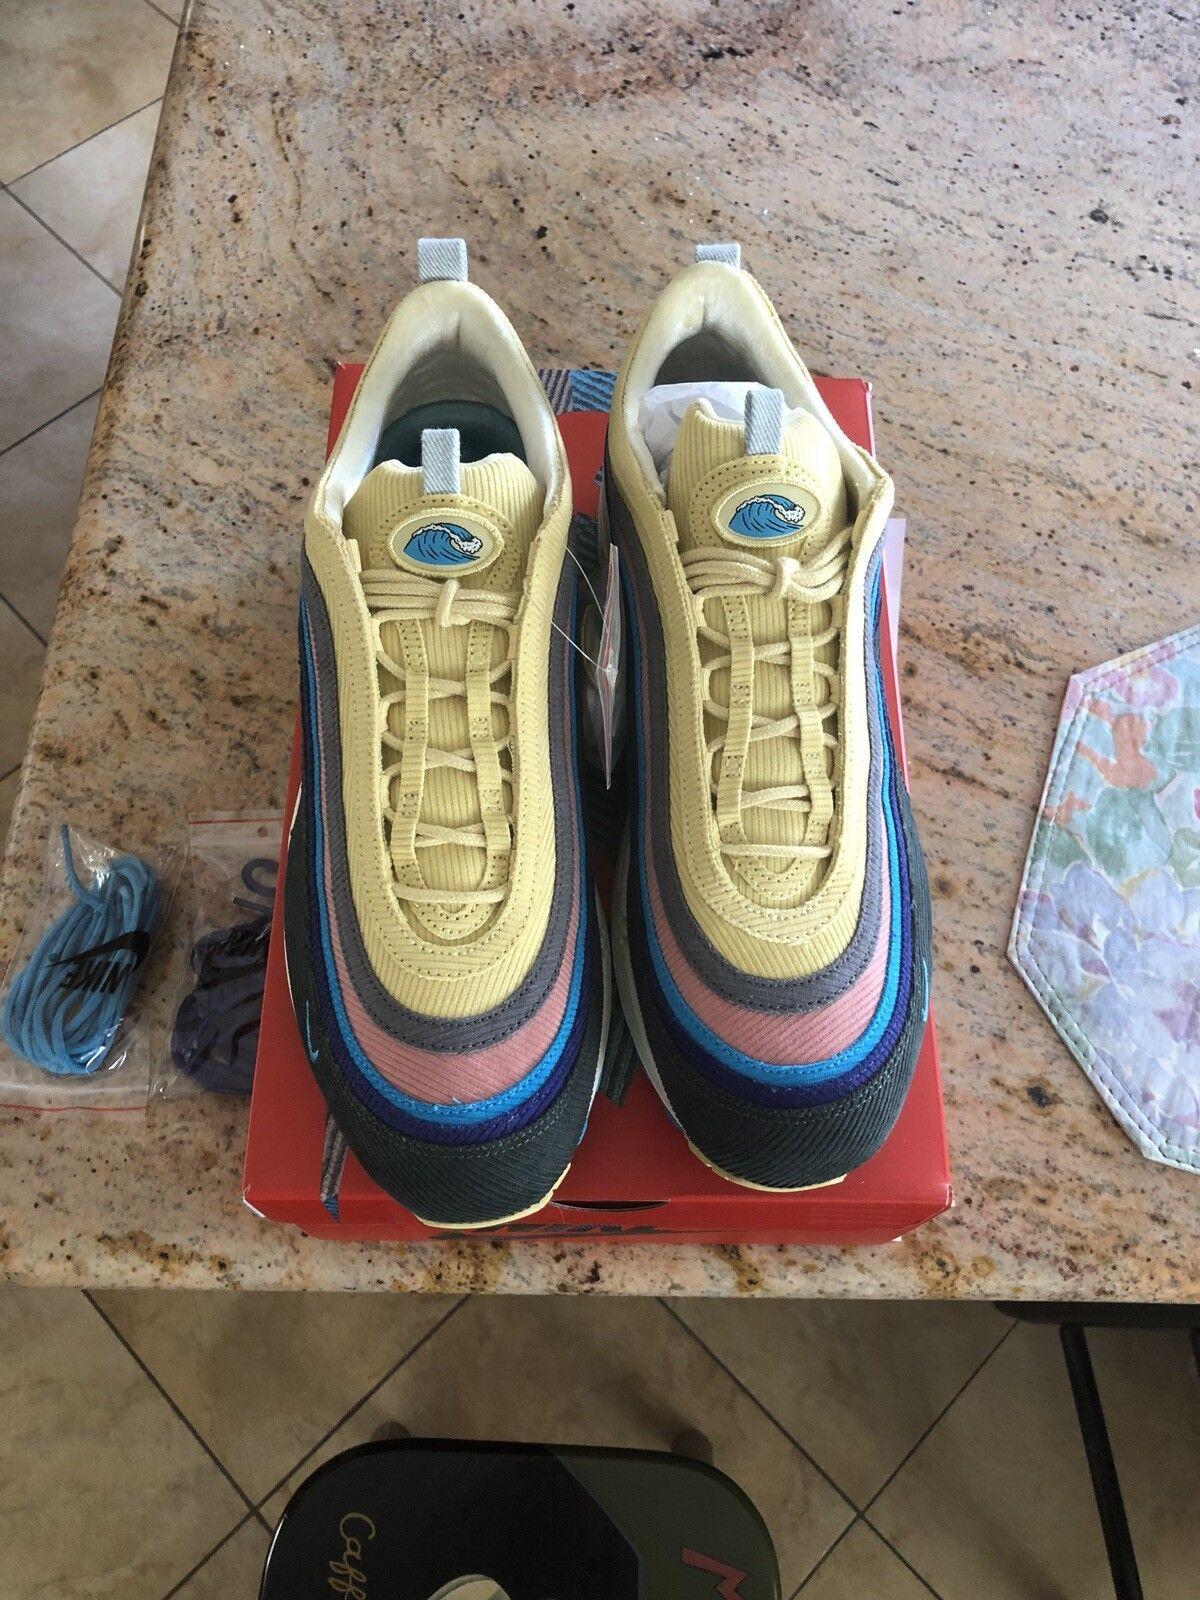 Nike air vf max 1 / 97 vf air sw sean wortherspoon taglia 12 aj4219 400 adc0fe